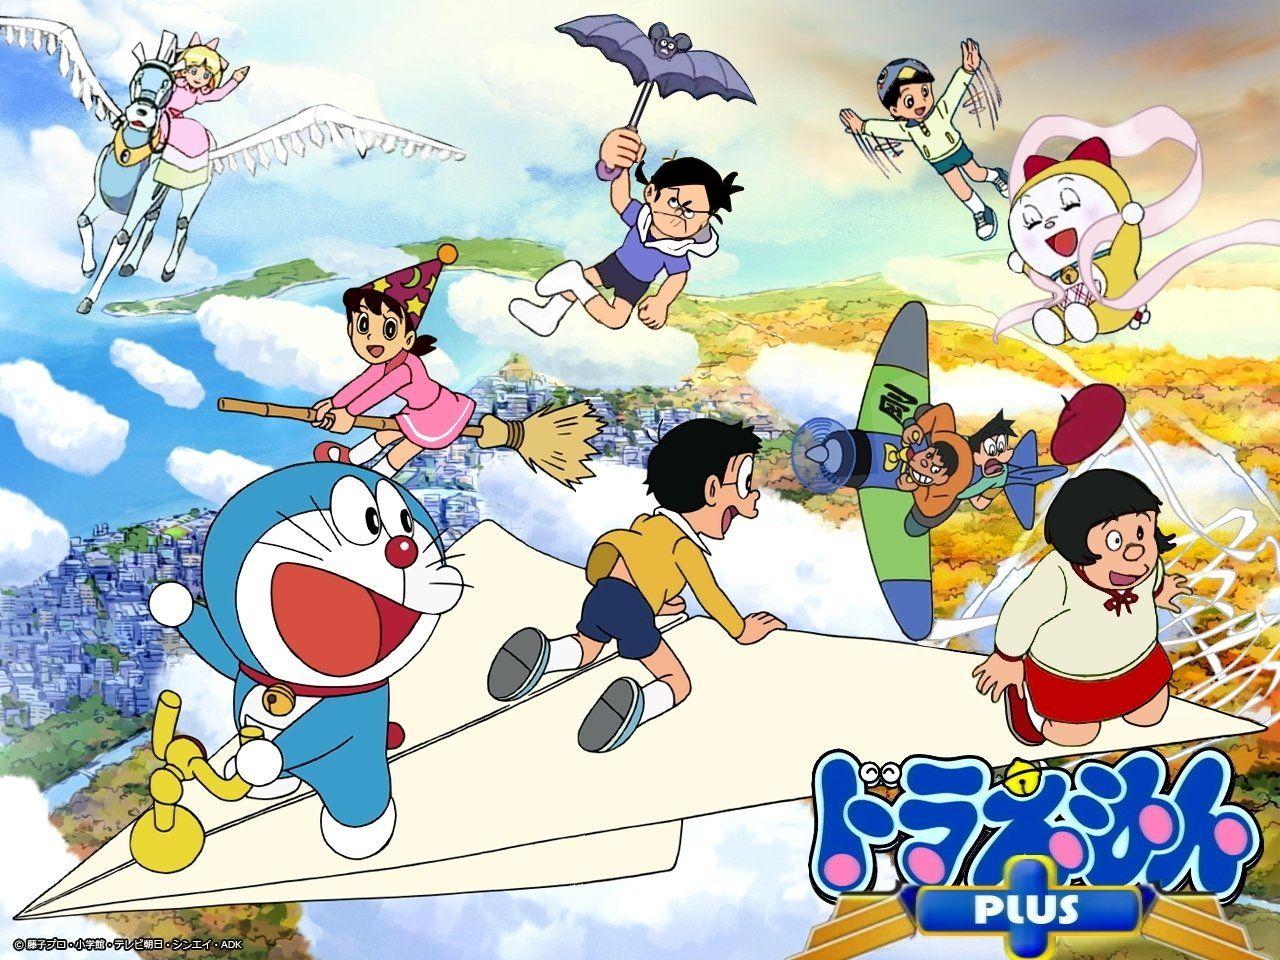 Doraemon Image - ID: 390970 - Image Abyss